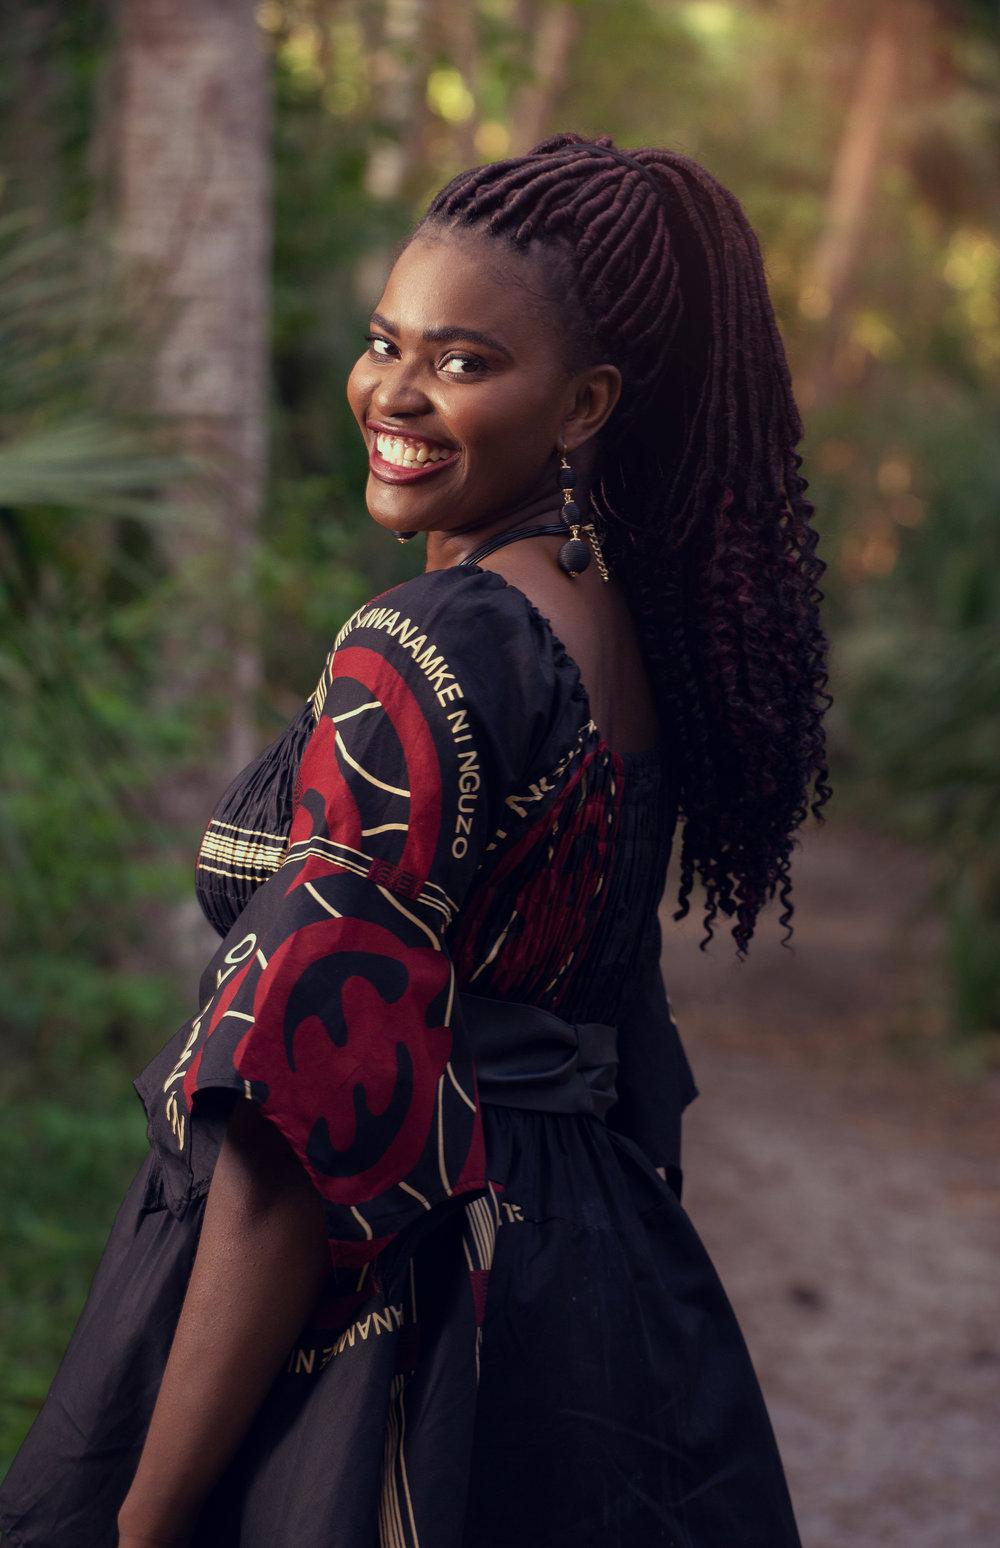 bridgette-african-nigerian-chamber-photography-photo-shoot6.jpg